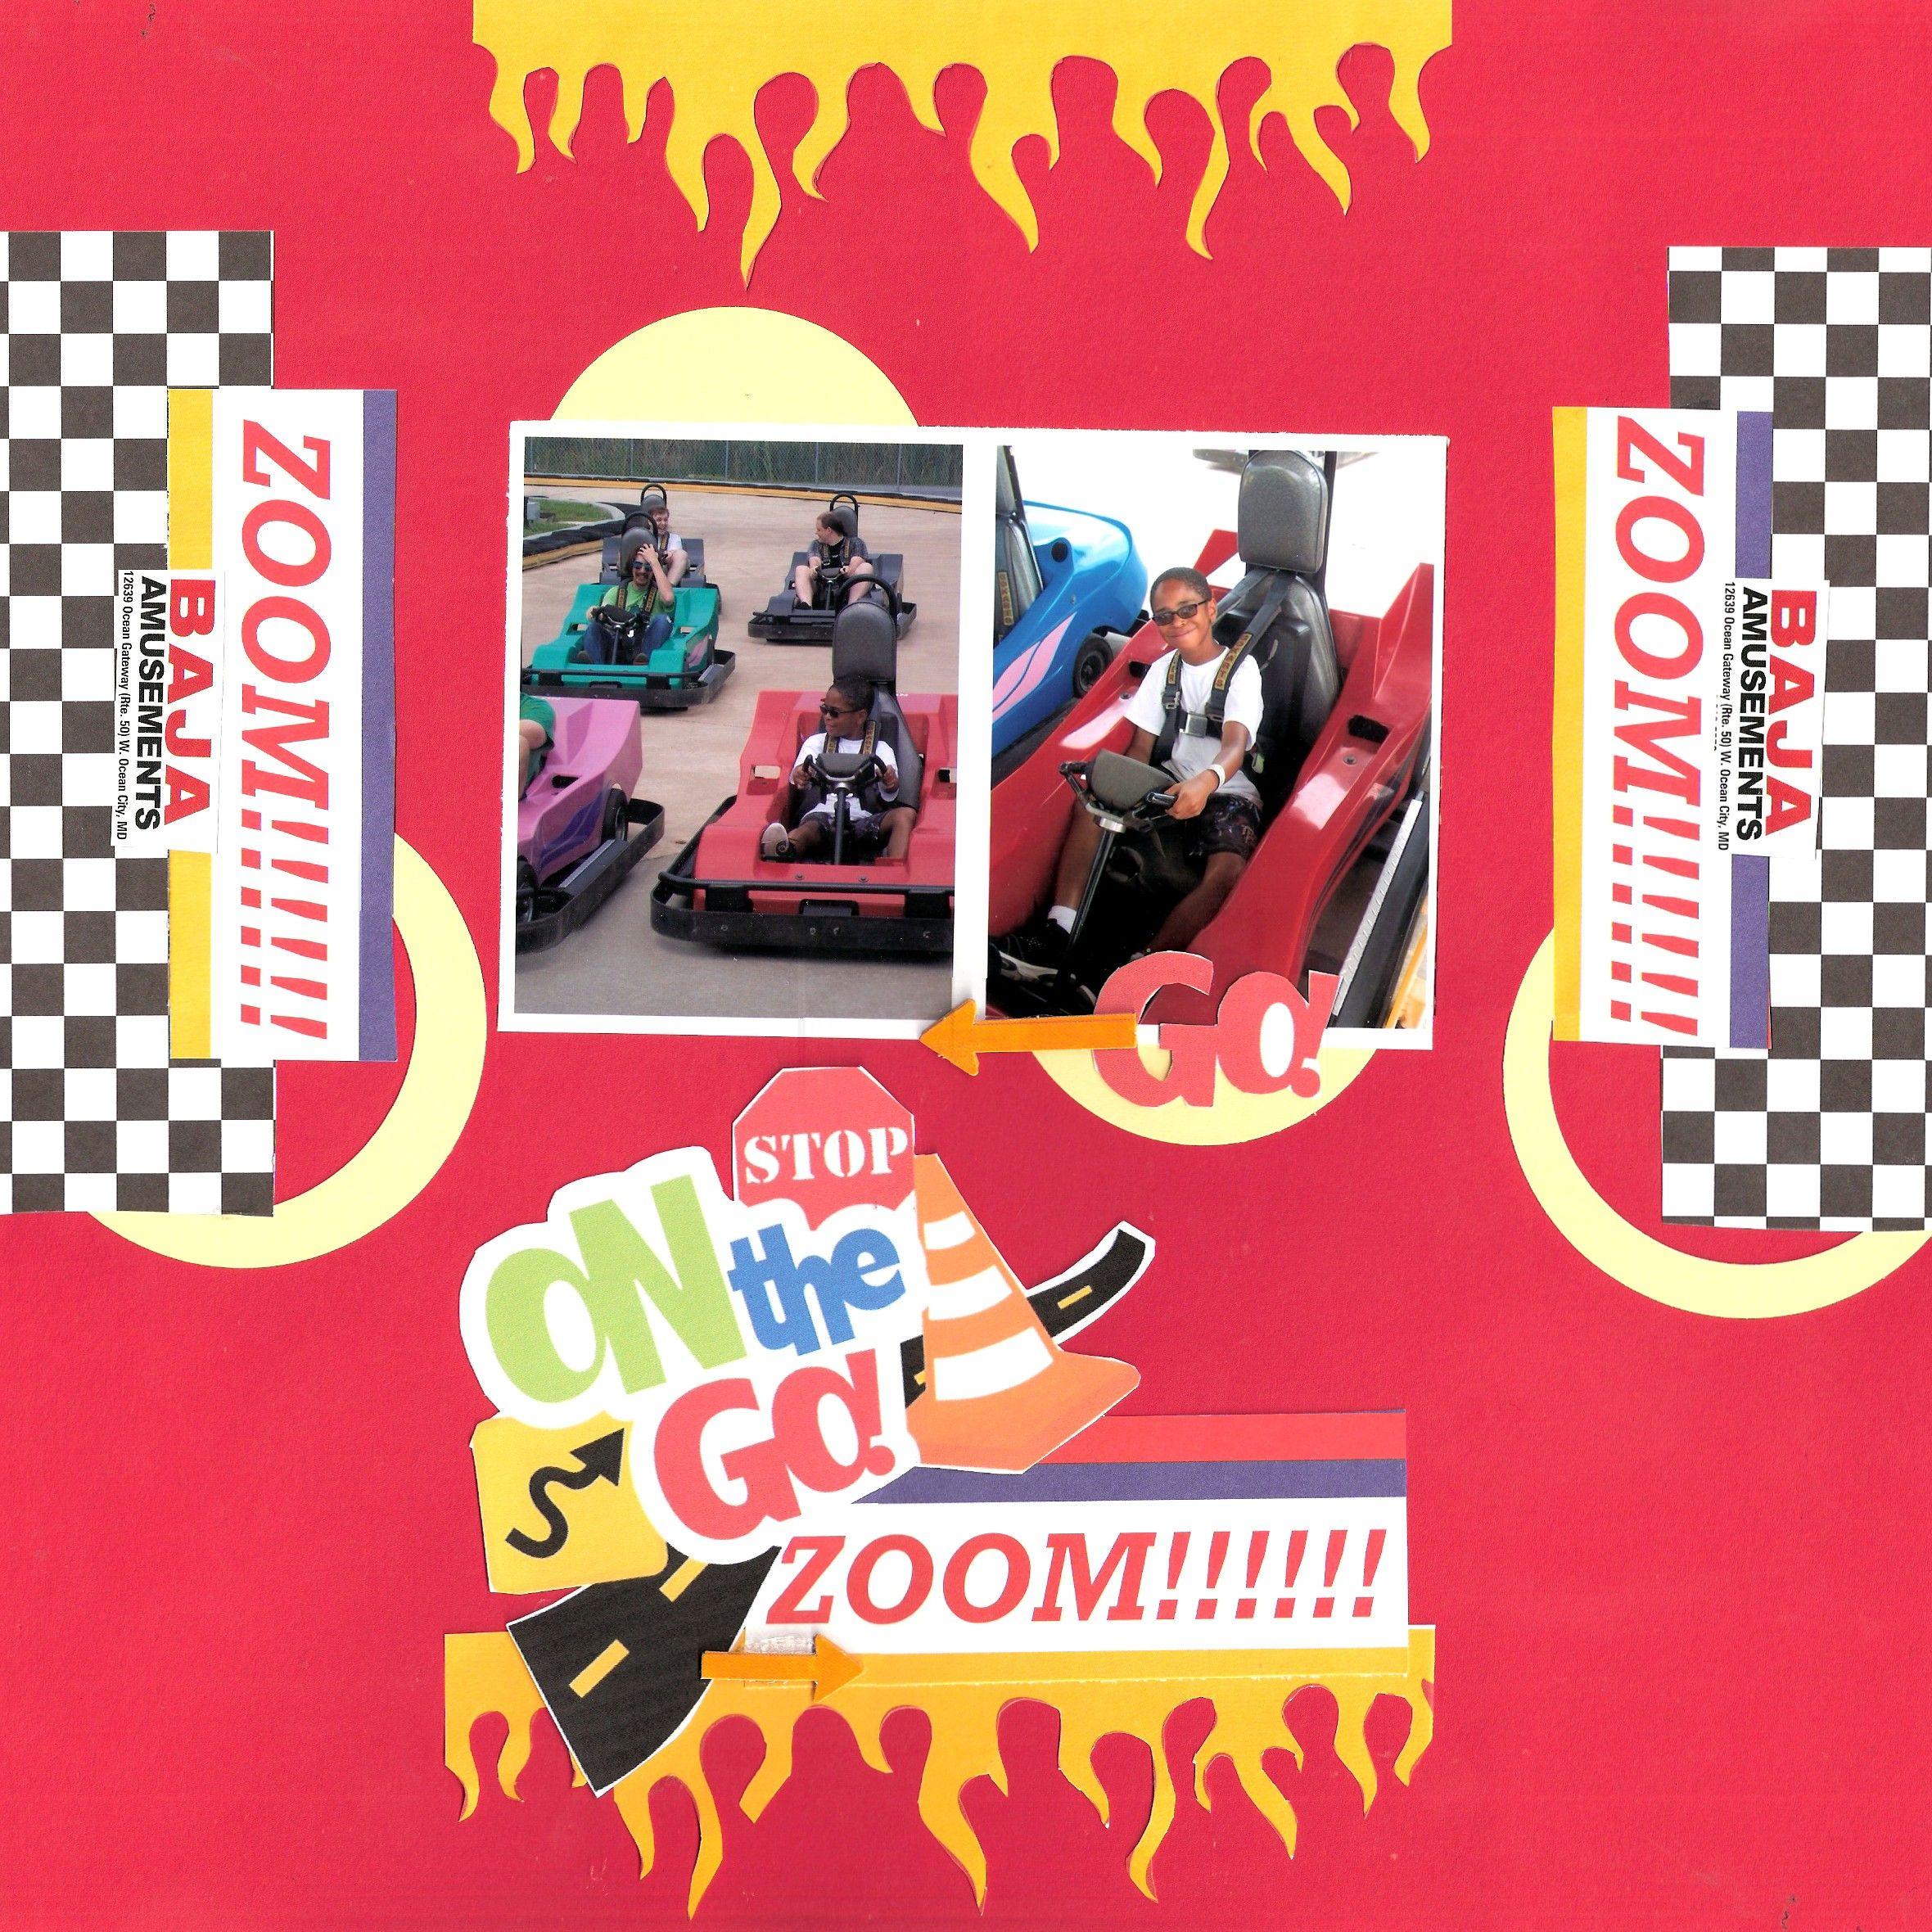 On The Go!! Zoom!!   ***Ocean City MD / Baja Amusements*** - Scrapbook.com